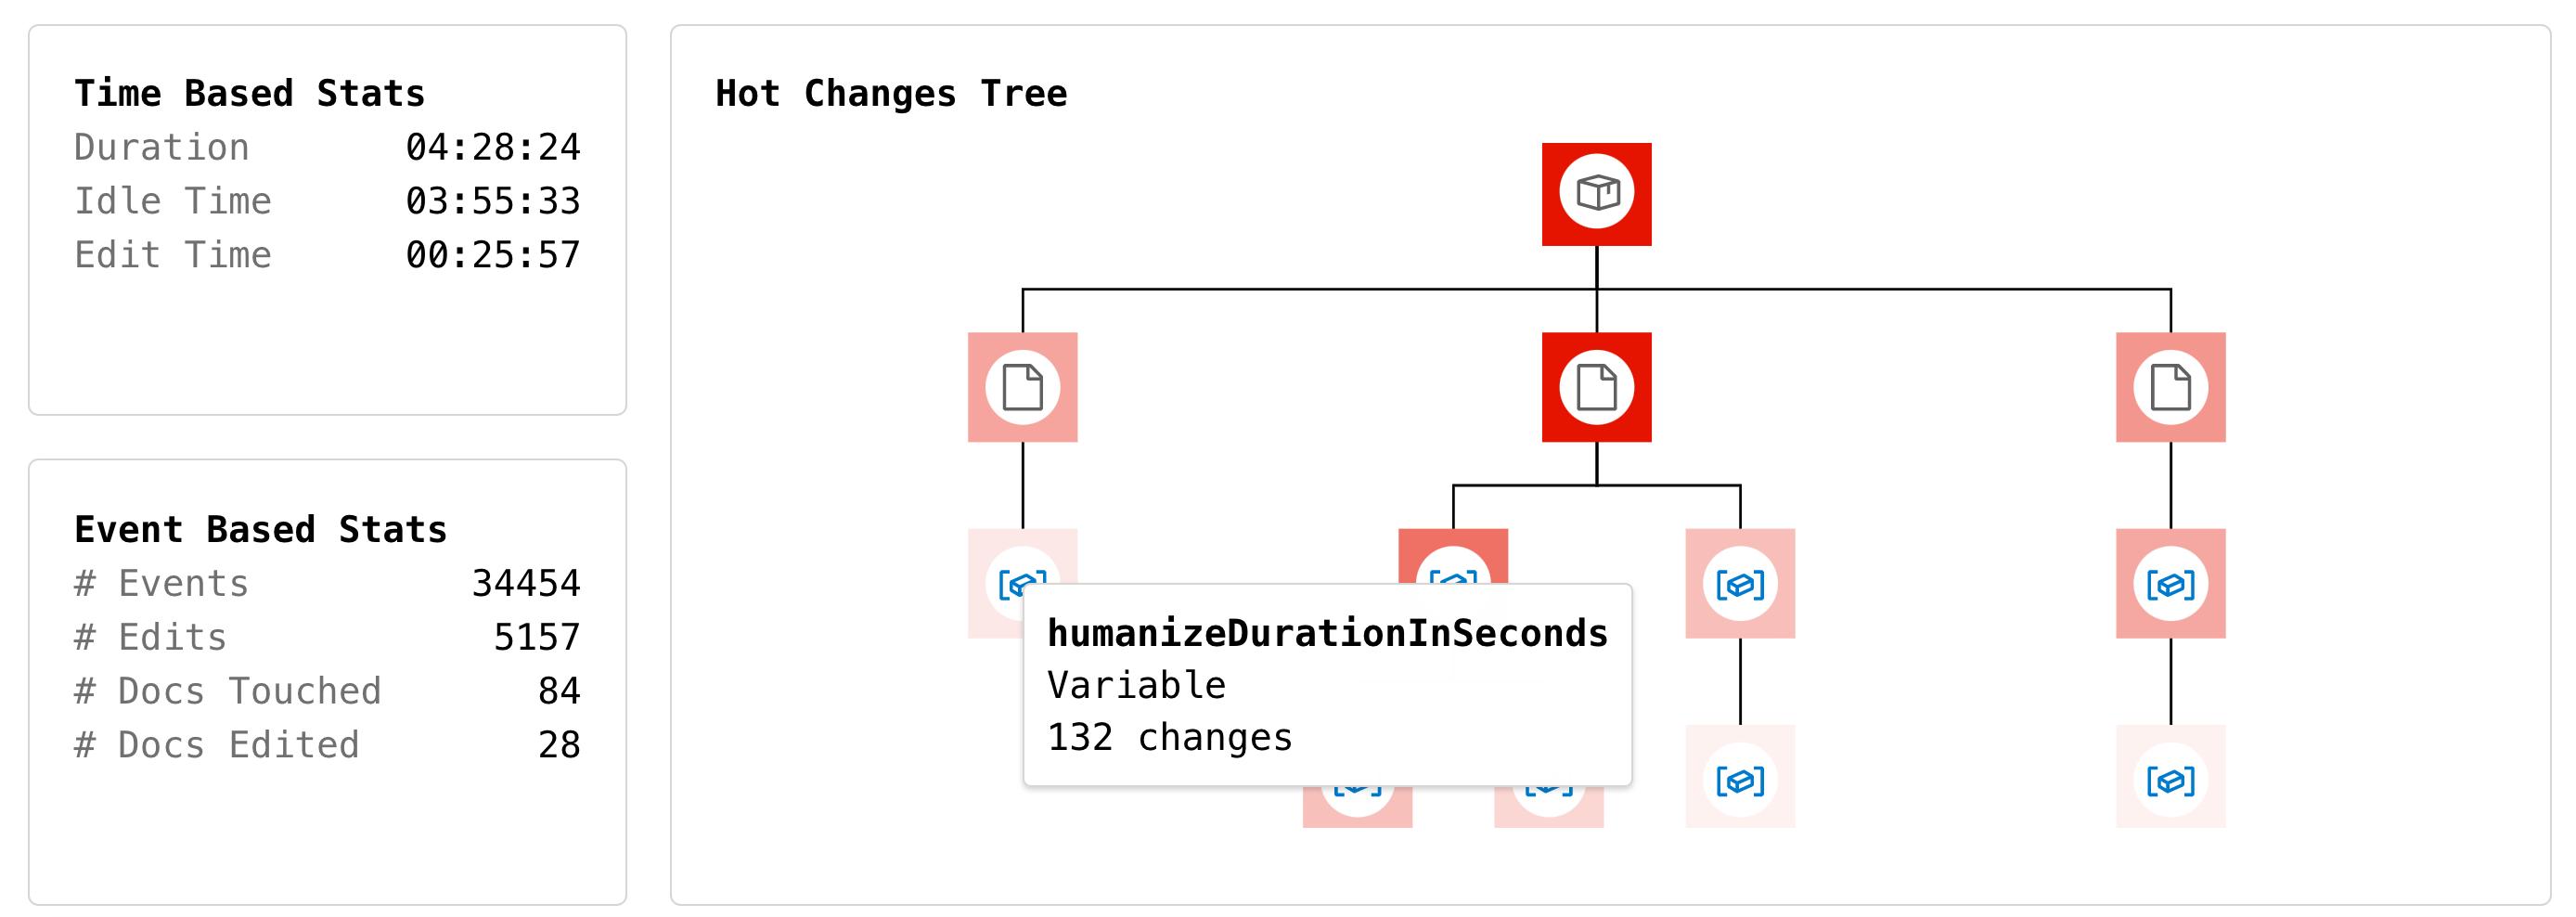 Tako Hot Changes Tree